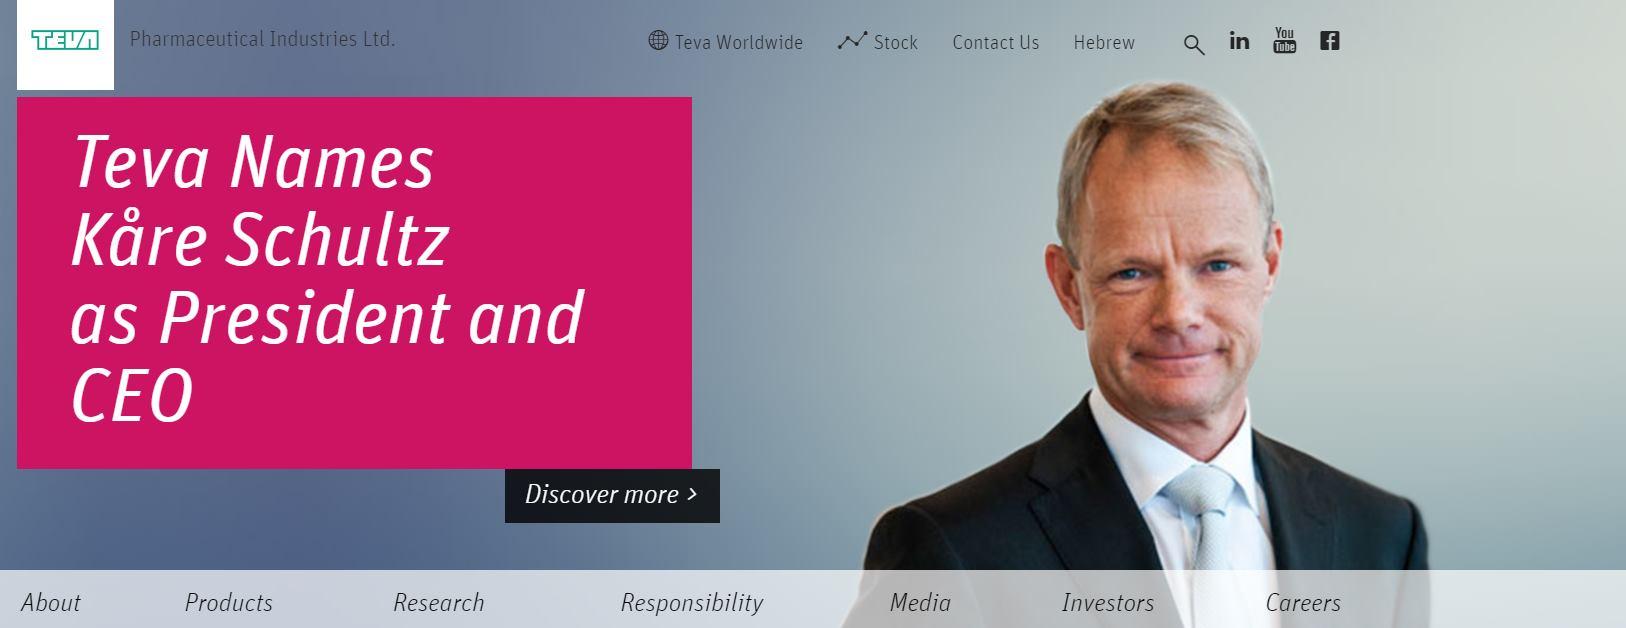 Teva imenovala Kårea Schultza predsjednikom i glavnim izvršnim direktorom